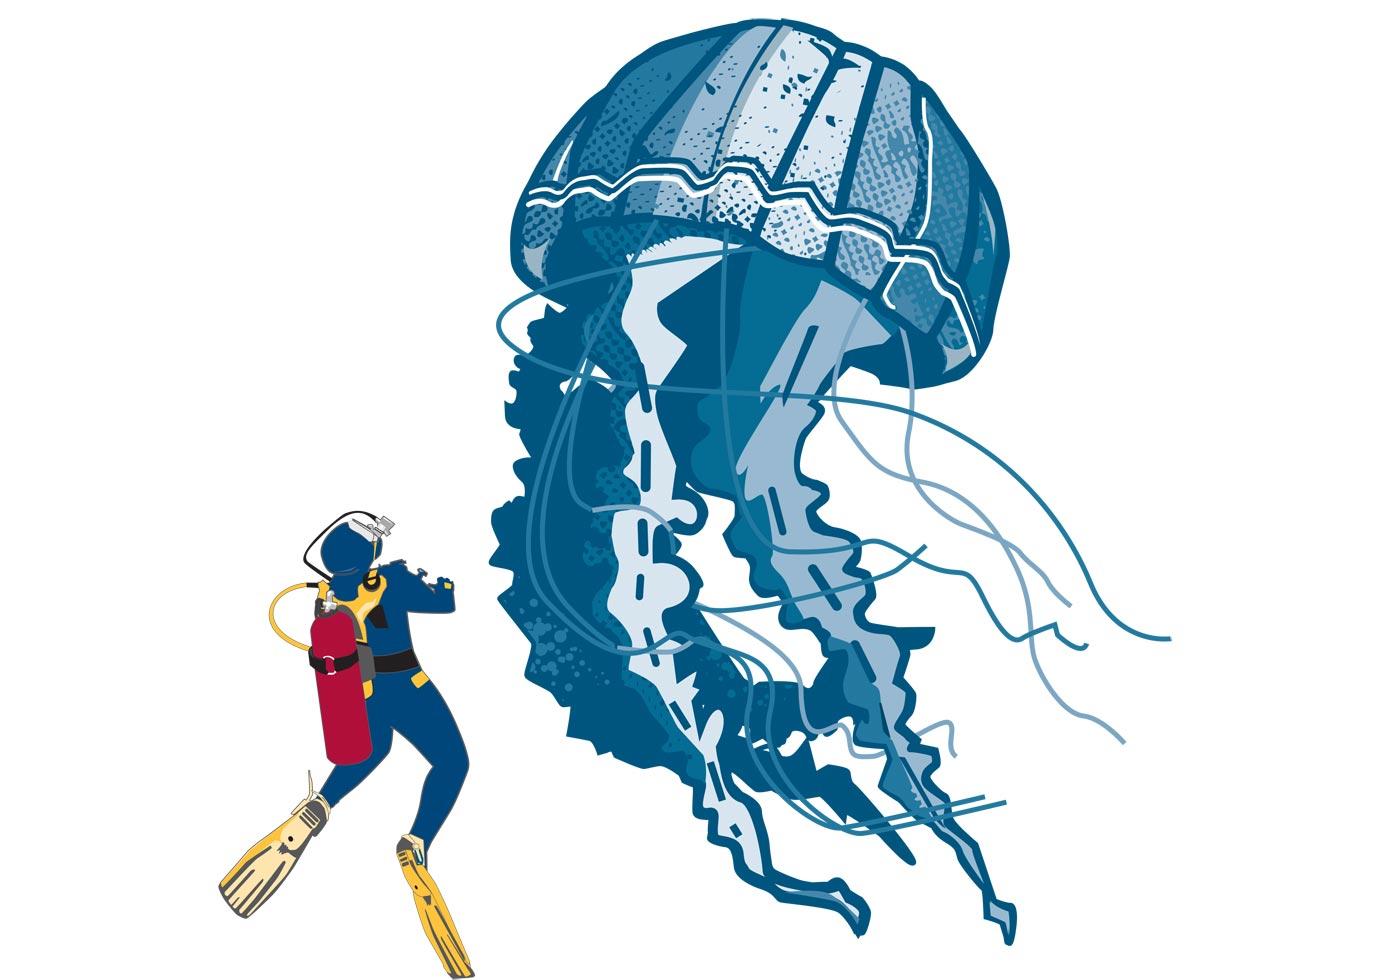 jellyfish free vector art 2361 free downloads rh vecteezy com jellyfish vector free jellyfish vectorial